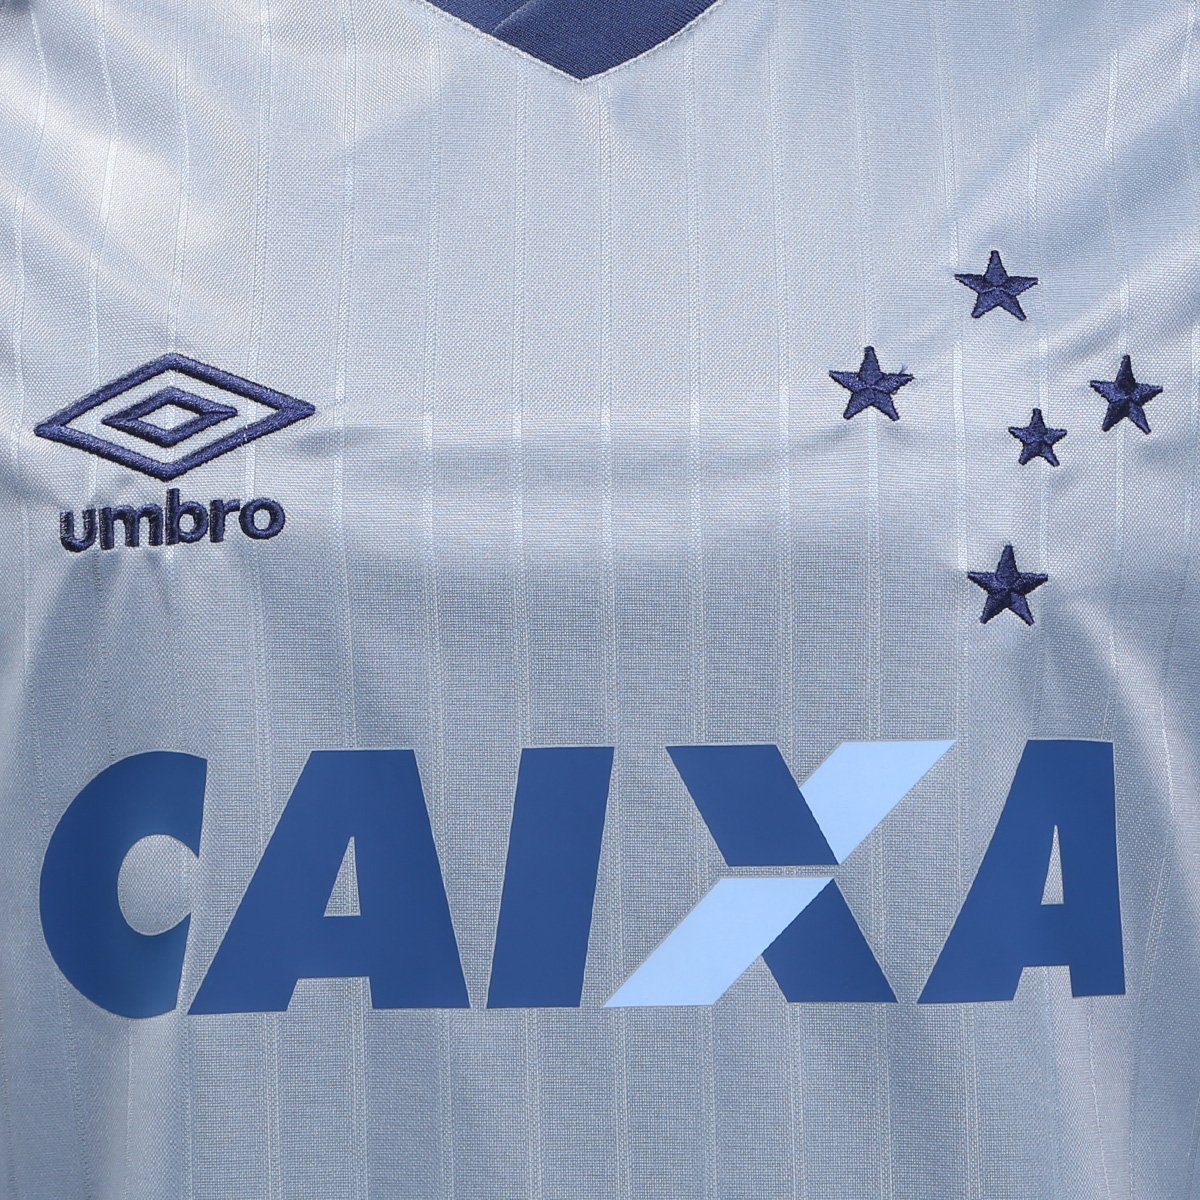 Camisa Cruzeiro III 18/19 s/n - Torcedor Umbro Masculina - Tam: GG - 2